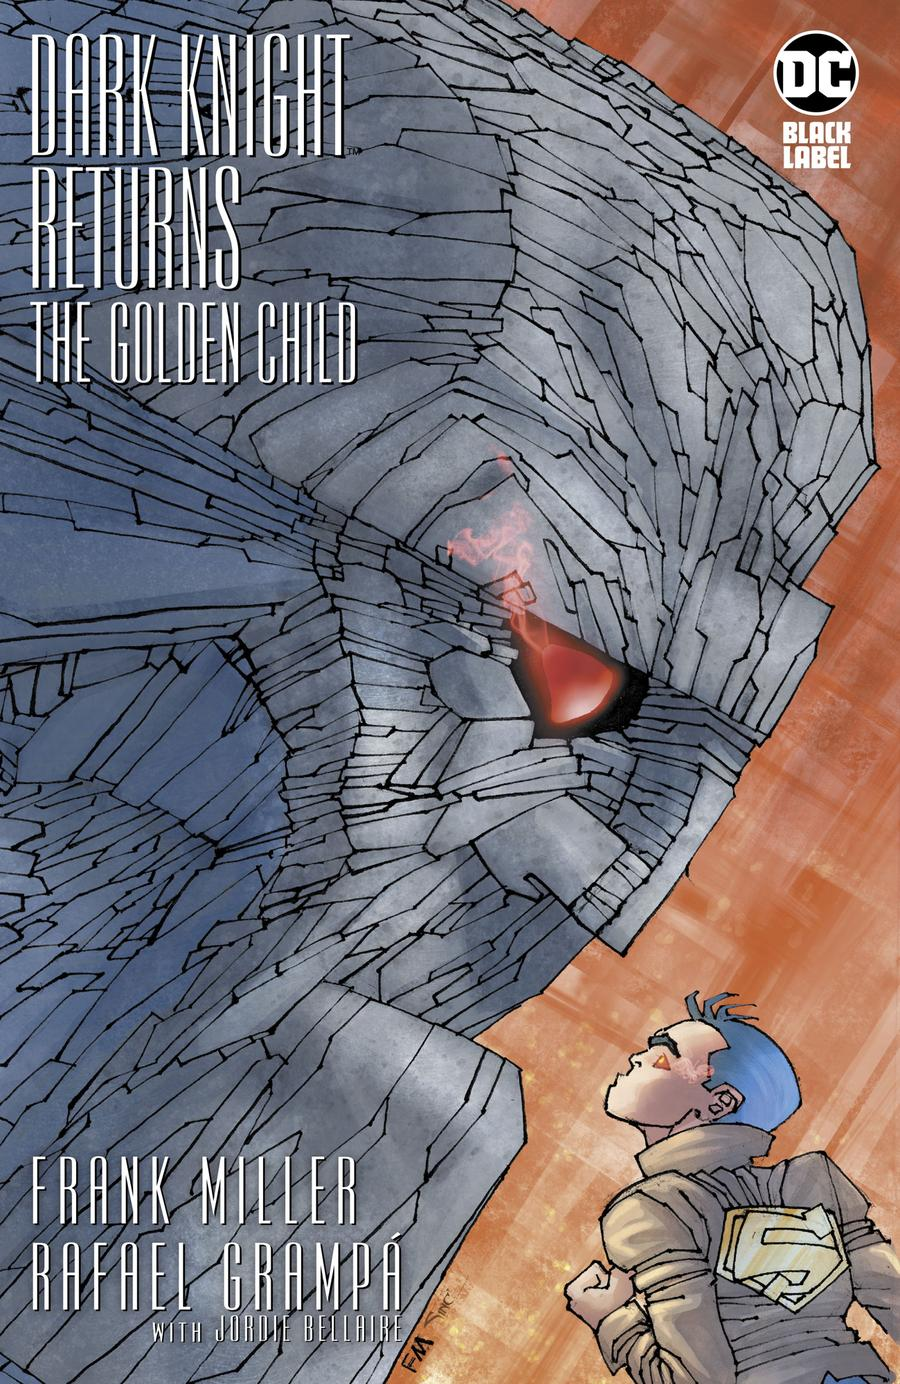 Dark Knight Returns The Golden Child #1 Cover E Incentive Frank Miller Variant Cover